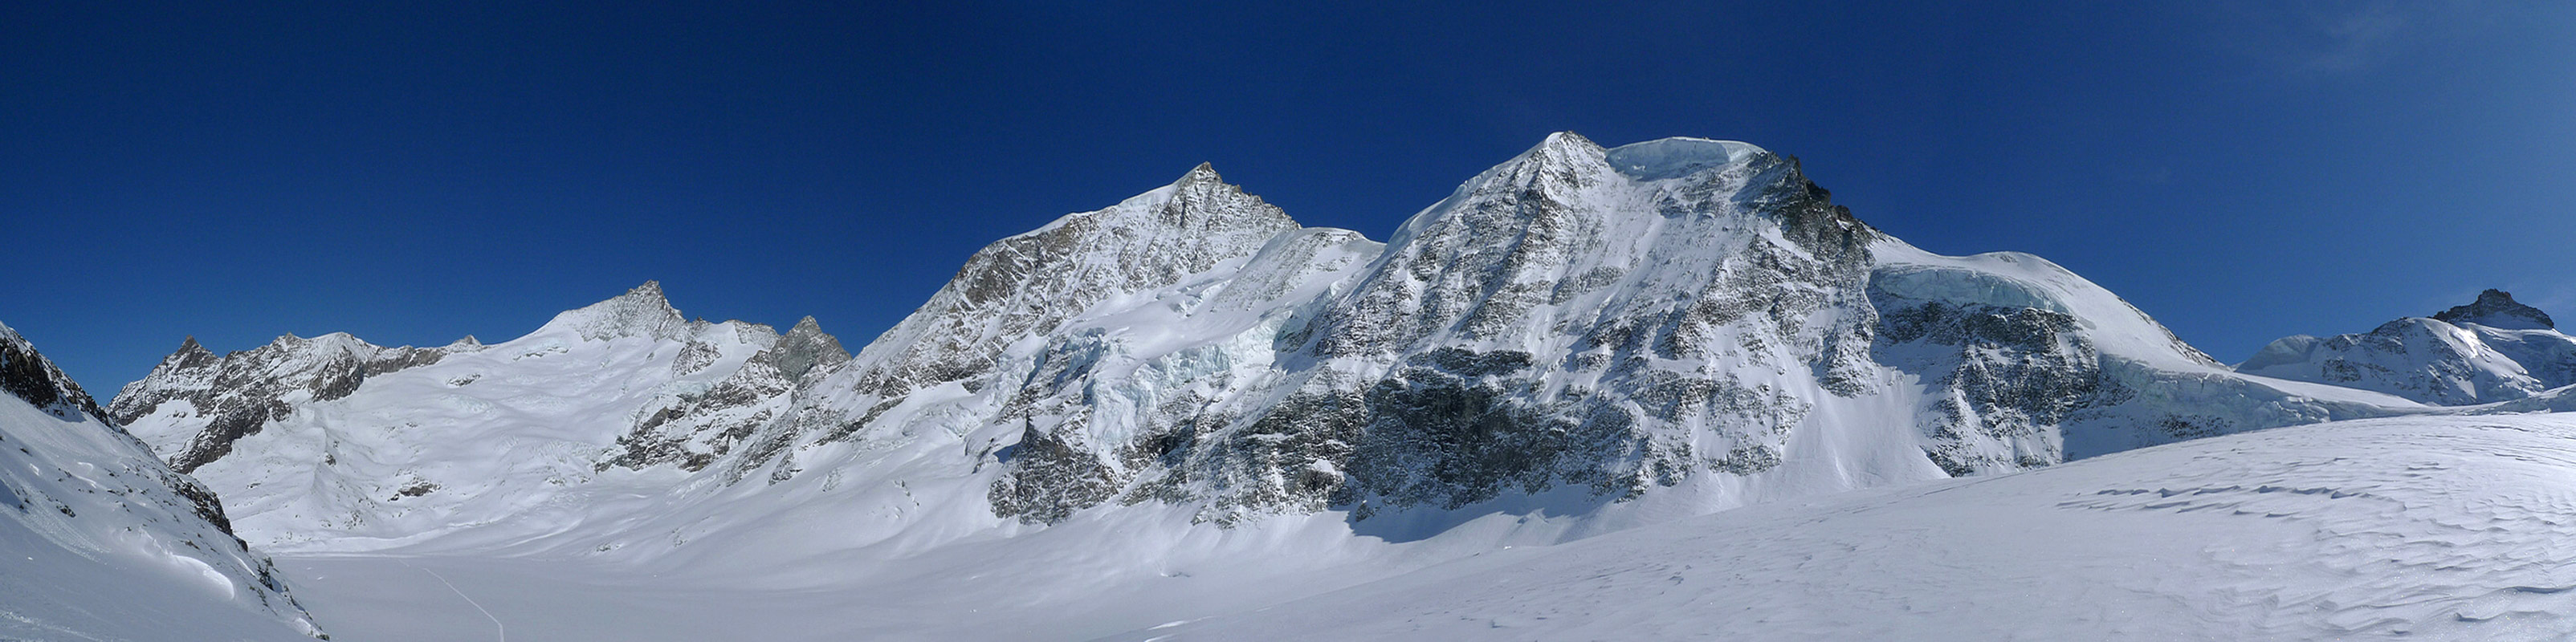 Mont Durand / Arbenhorn Walliser Alpen / Alpes valaisannes Schweiz panorama 46